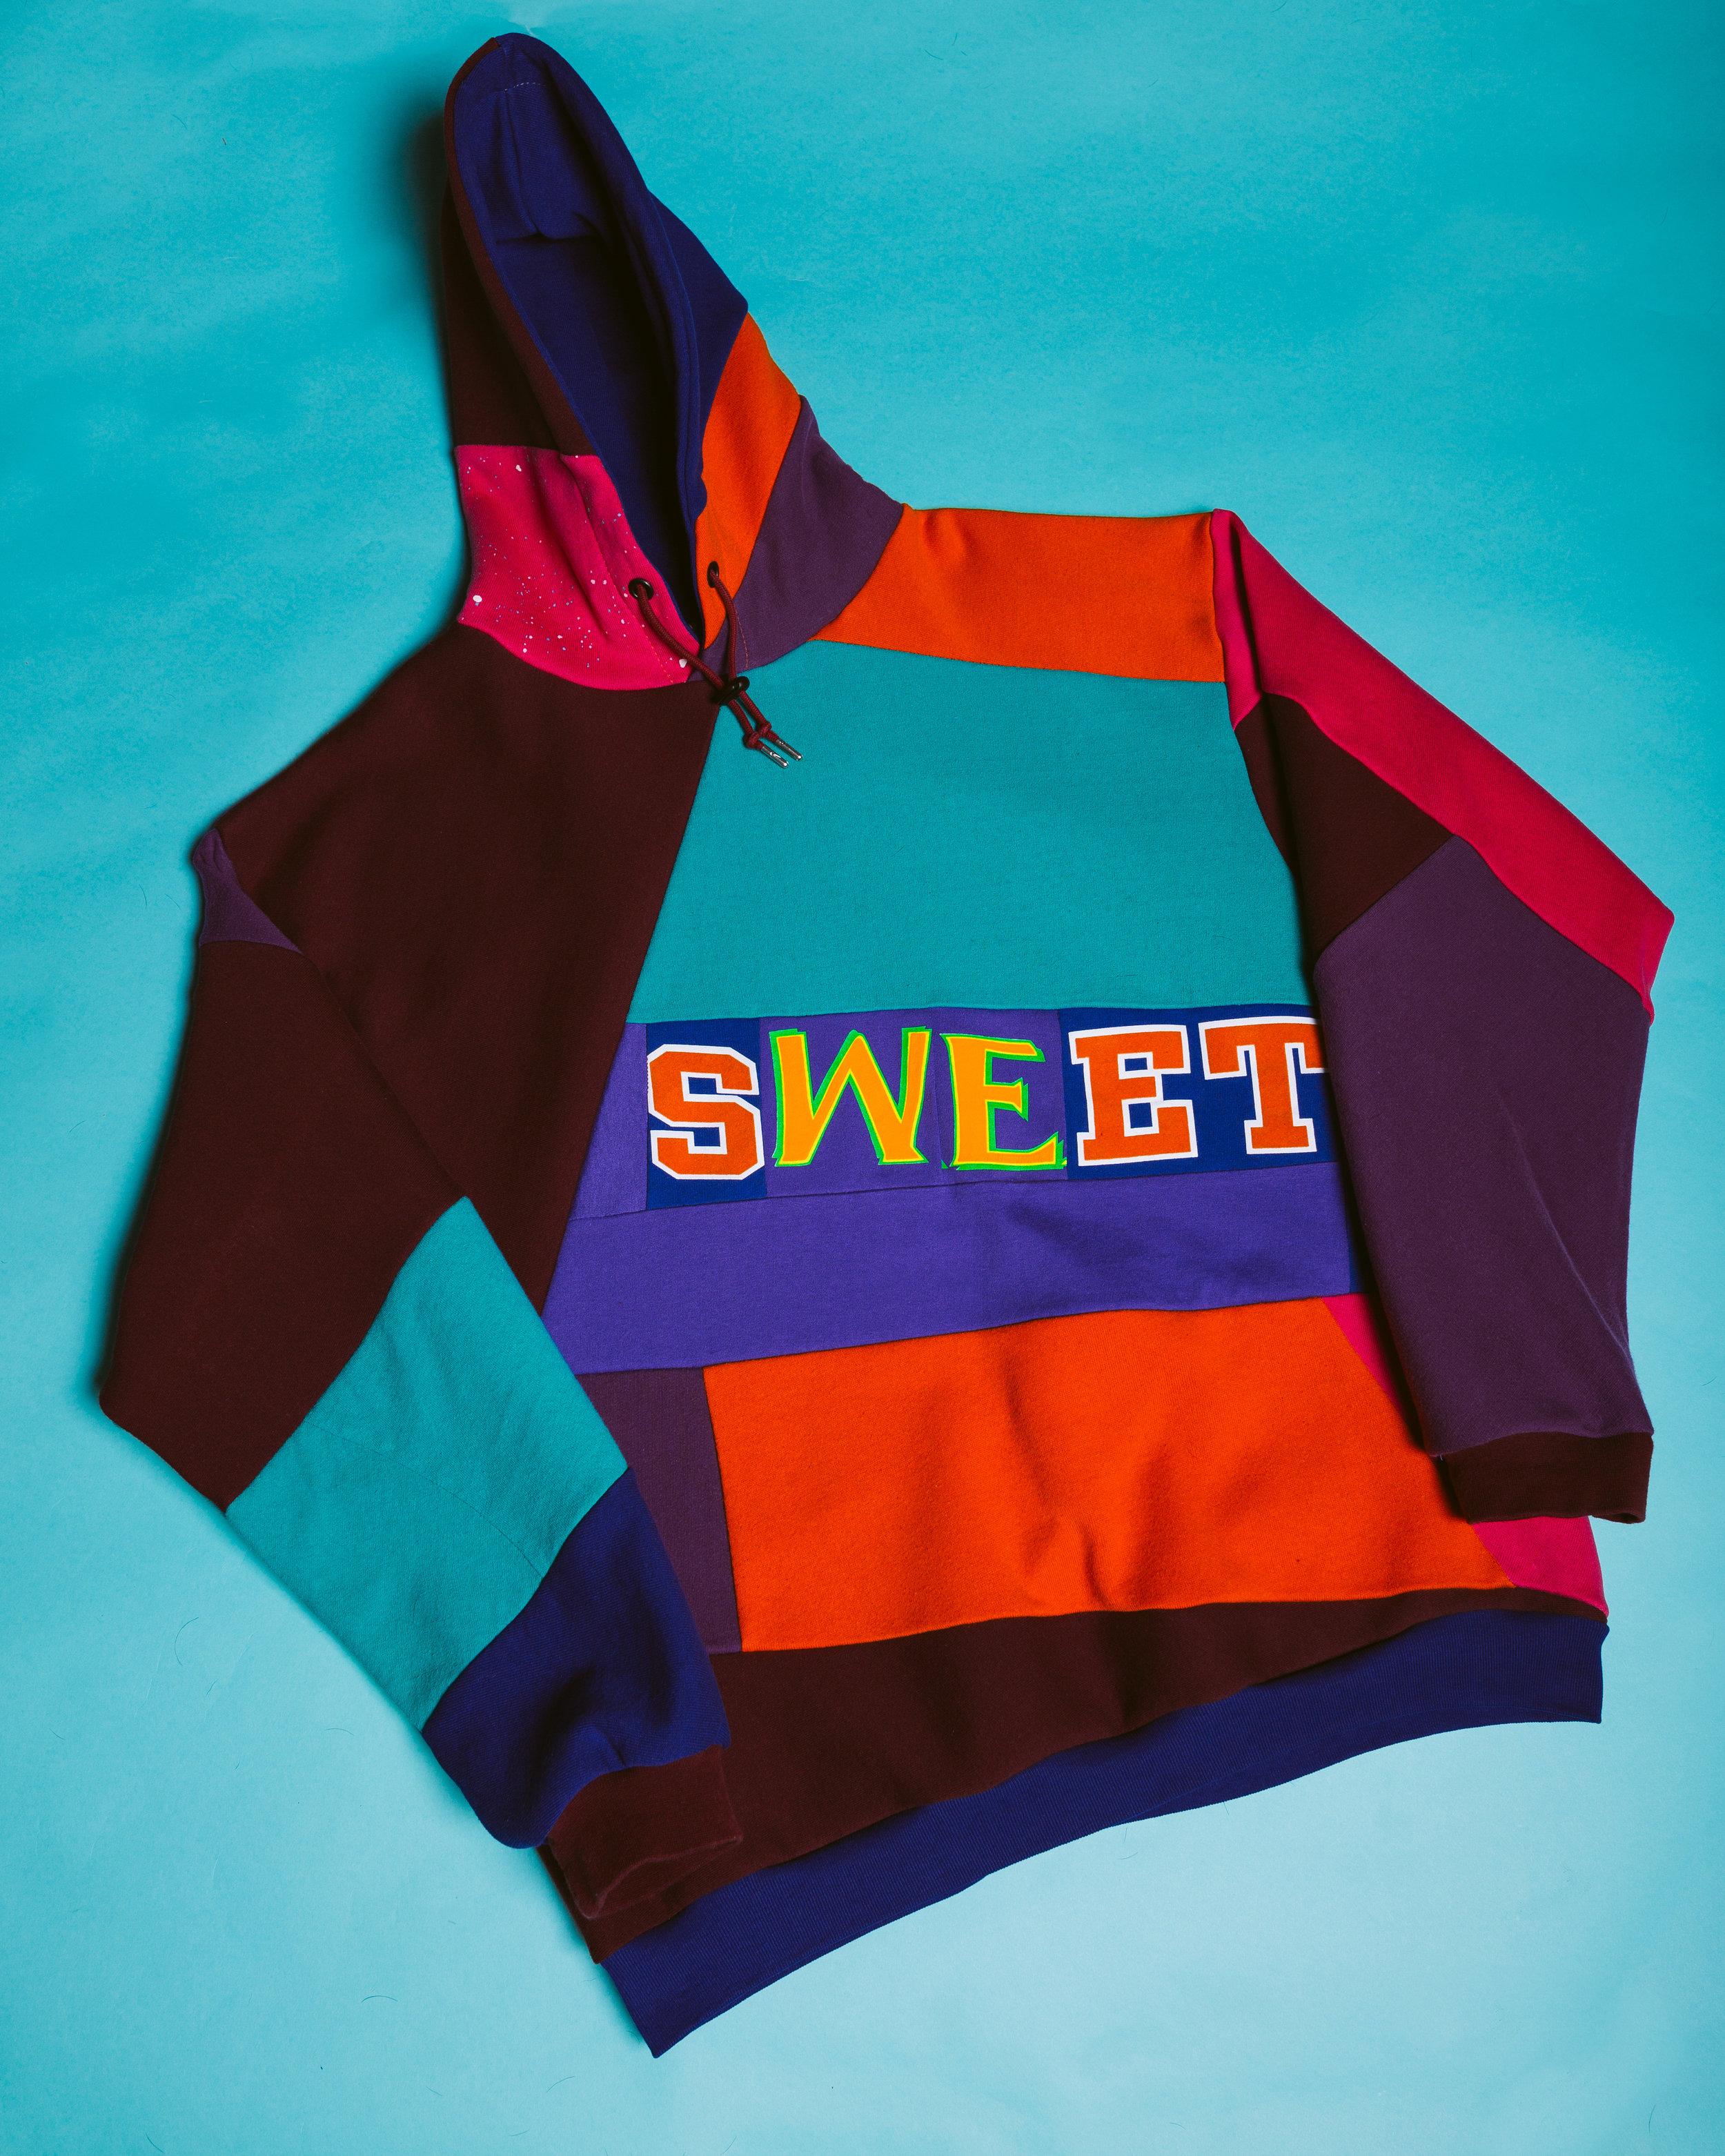 sweet-33.jpg